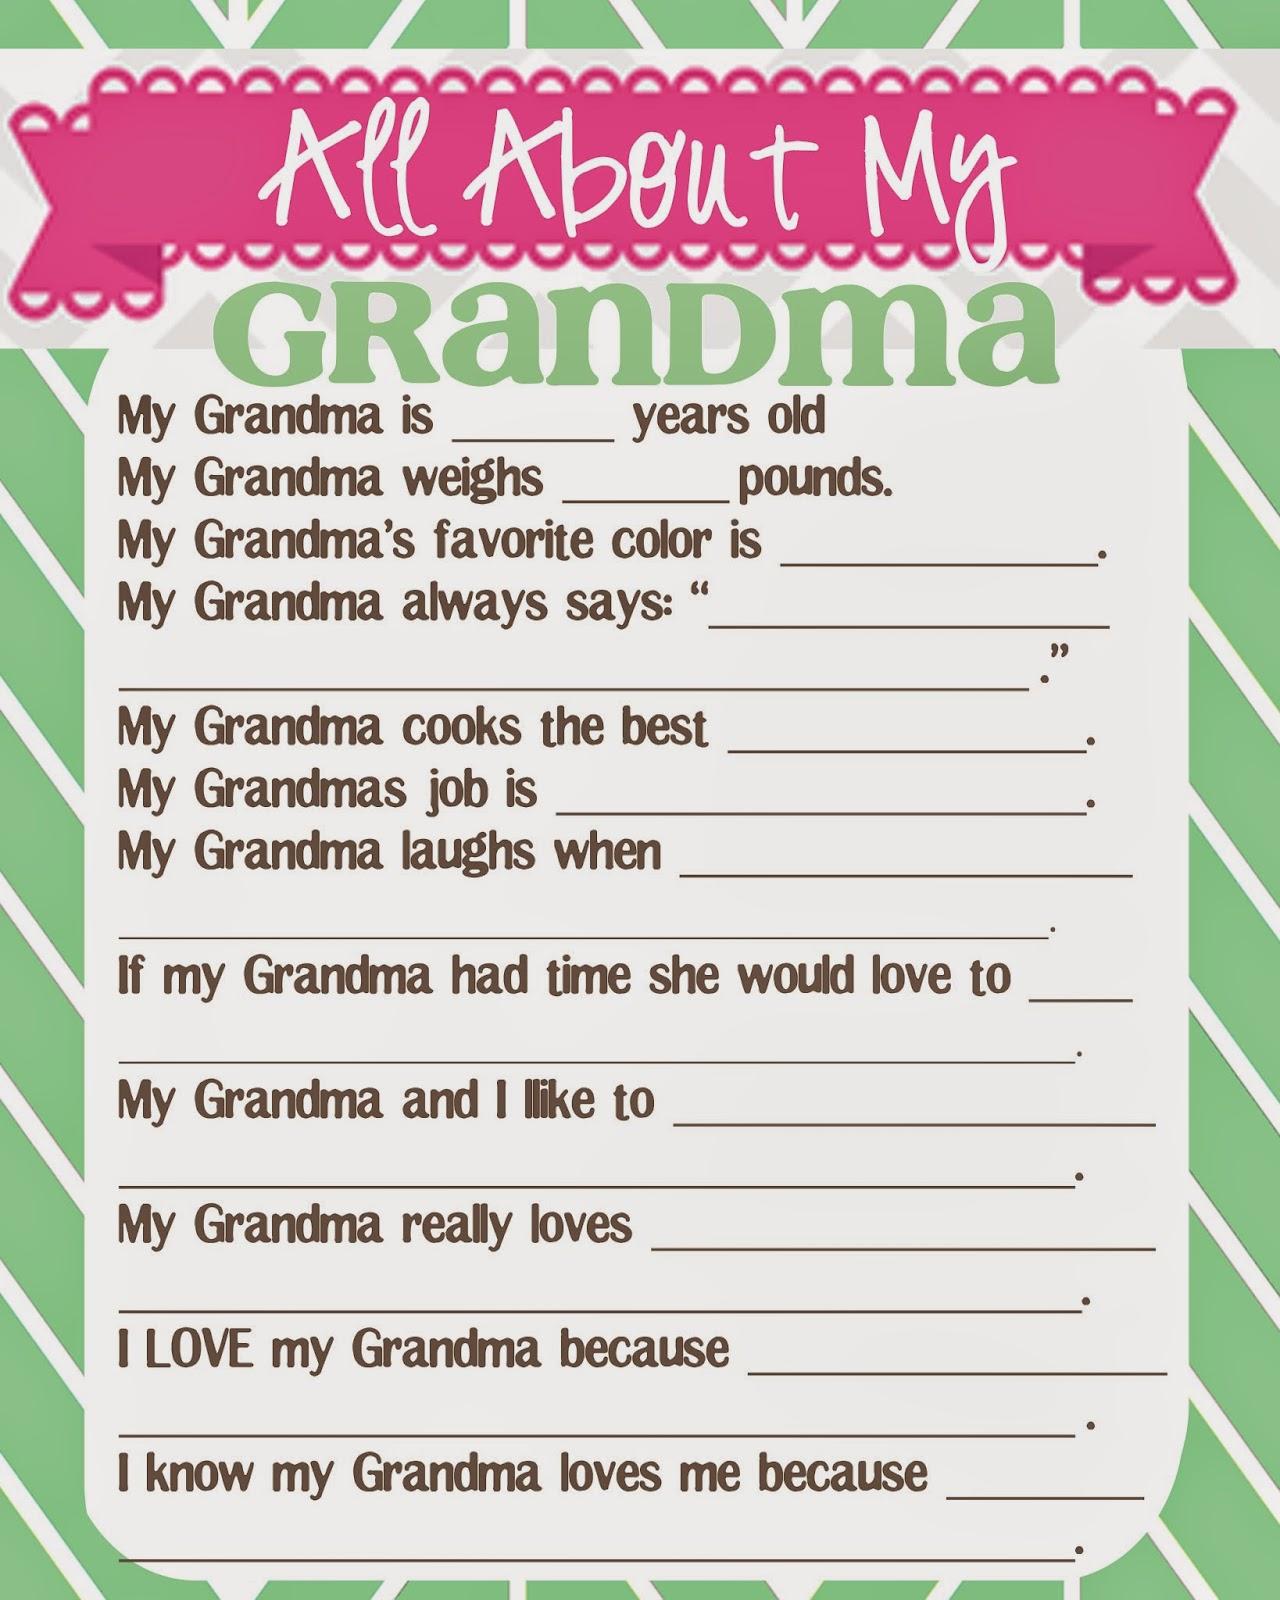 how to say grandma in german